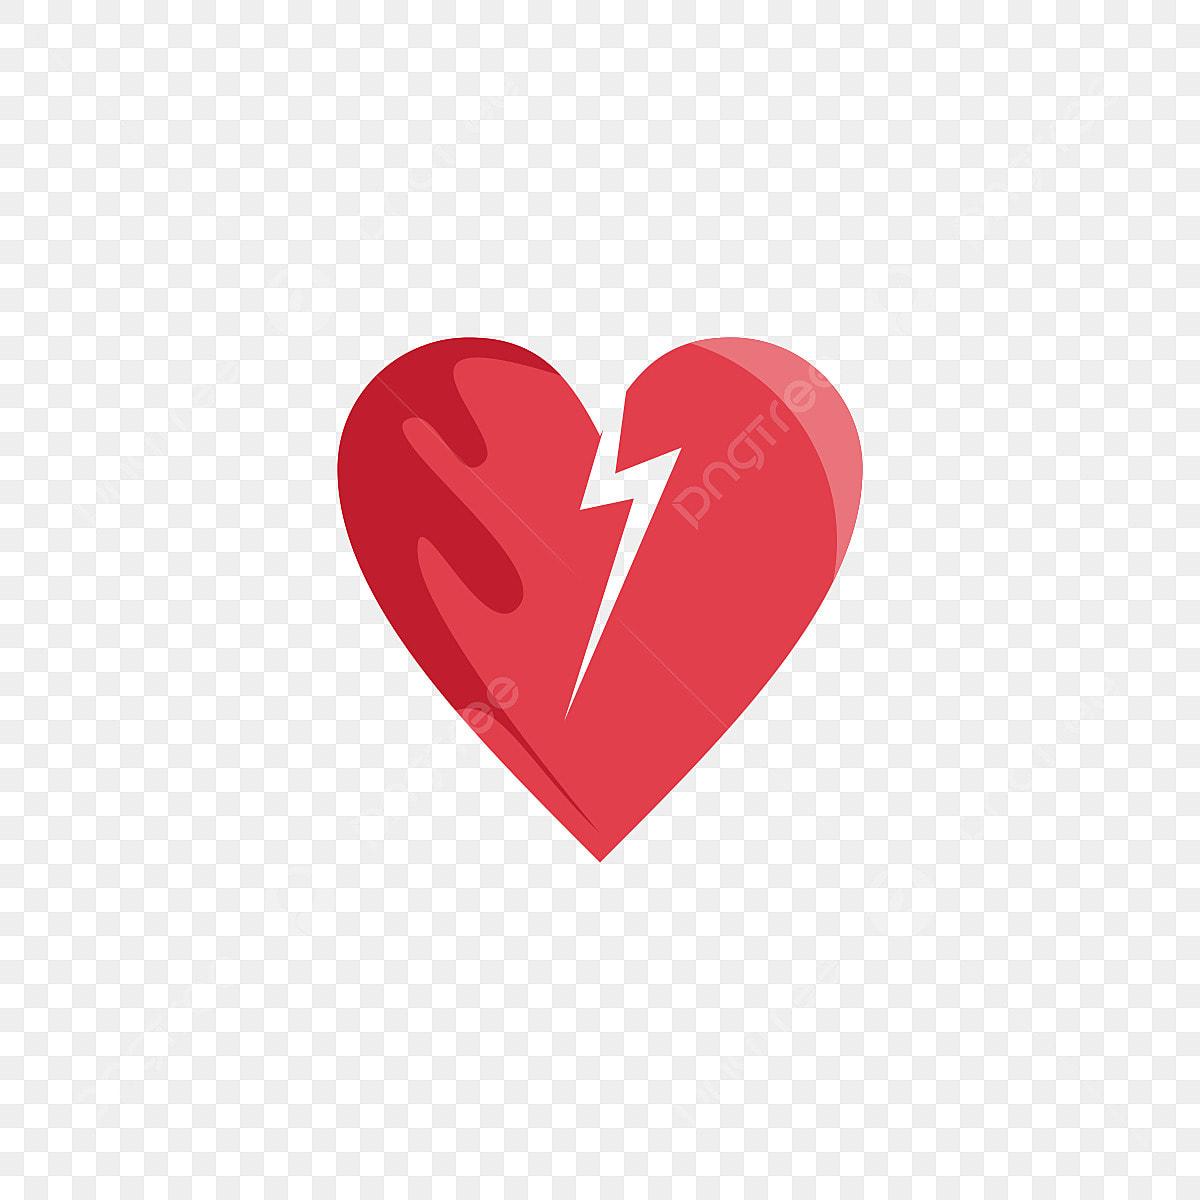 Top Five Broken Heart Icon Png - Circus